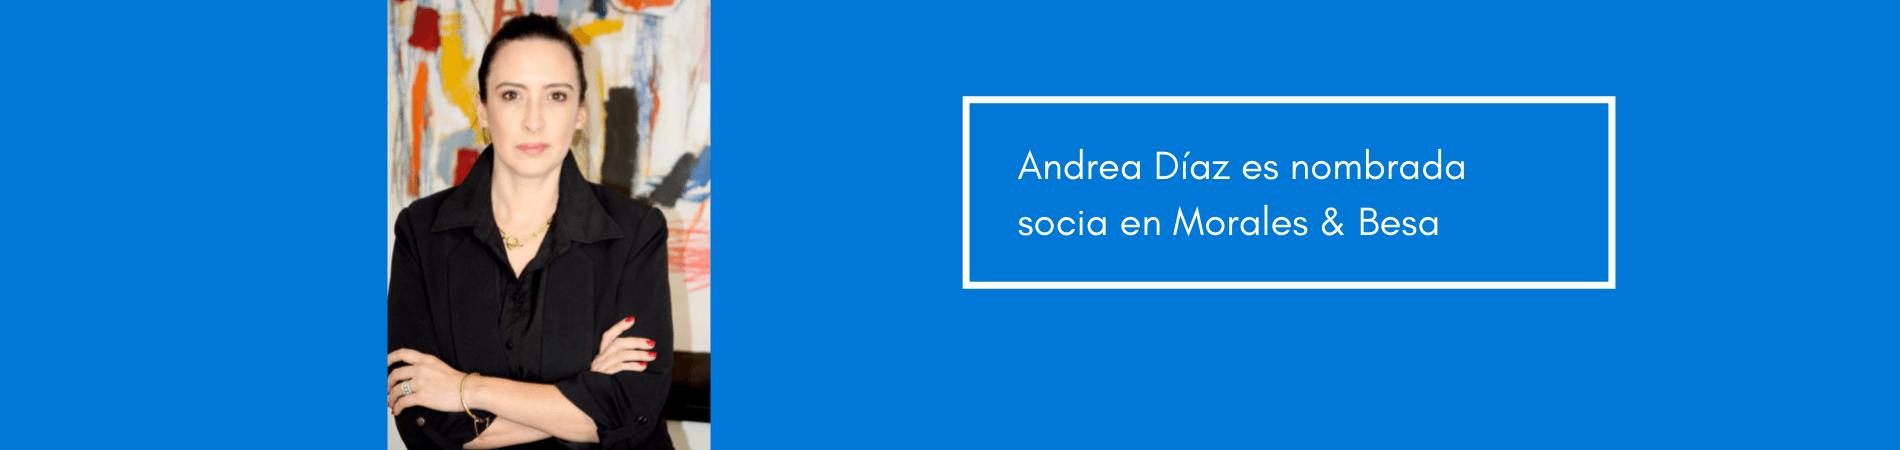 Andrea Díaz es nombrada socia en Morales & Besa